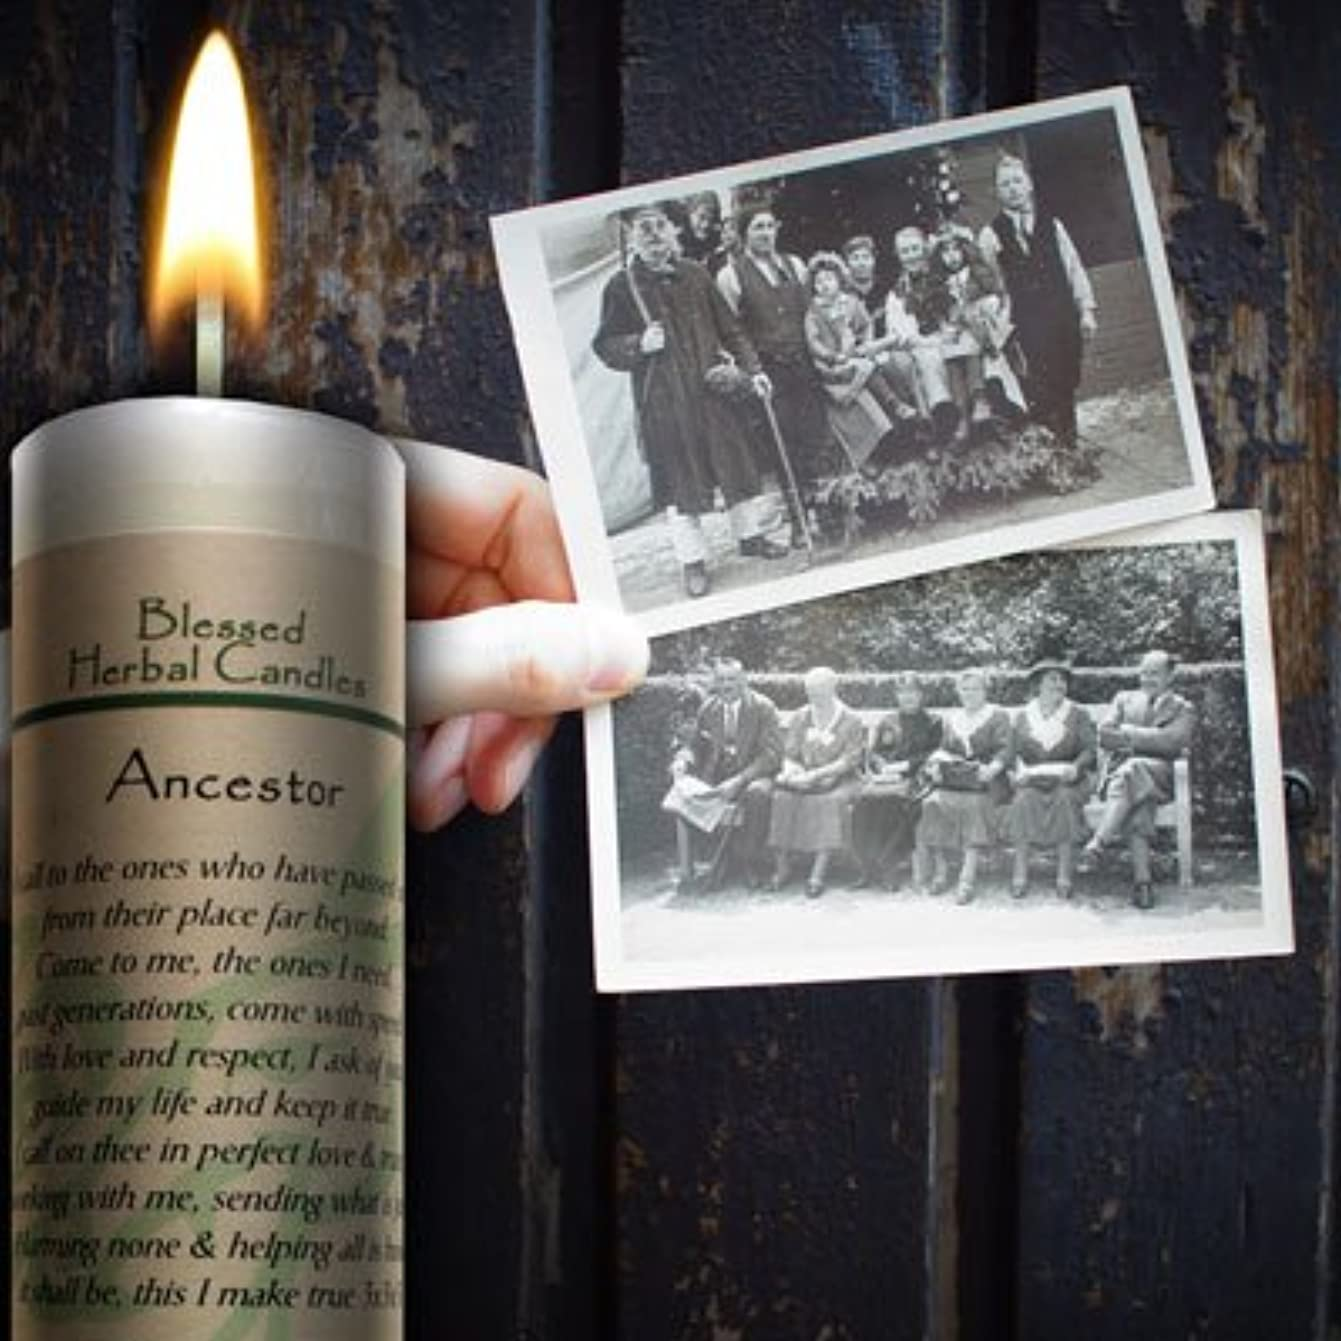 滝決定的消費Blessedハーブ祖先Candle